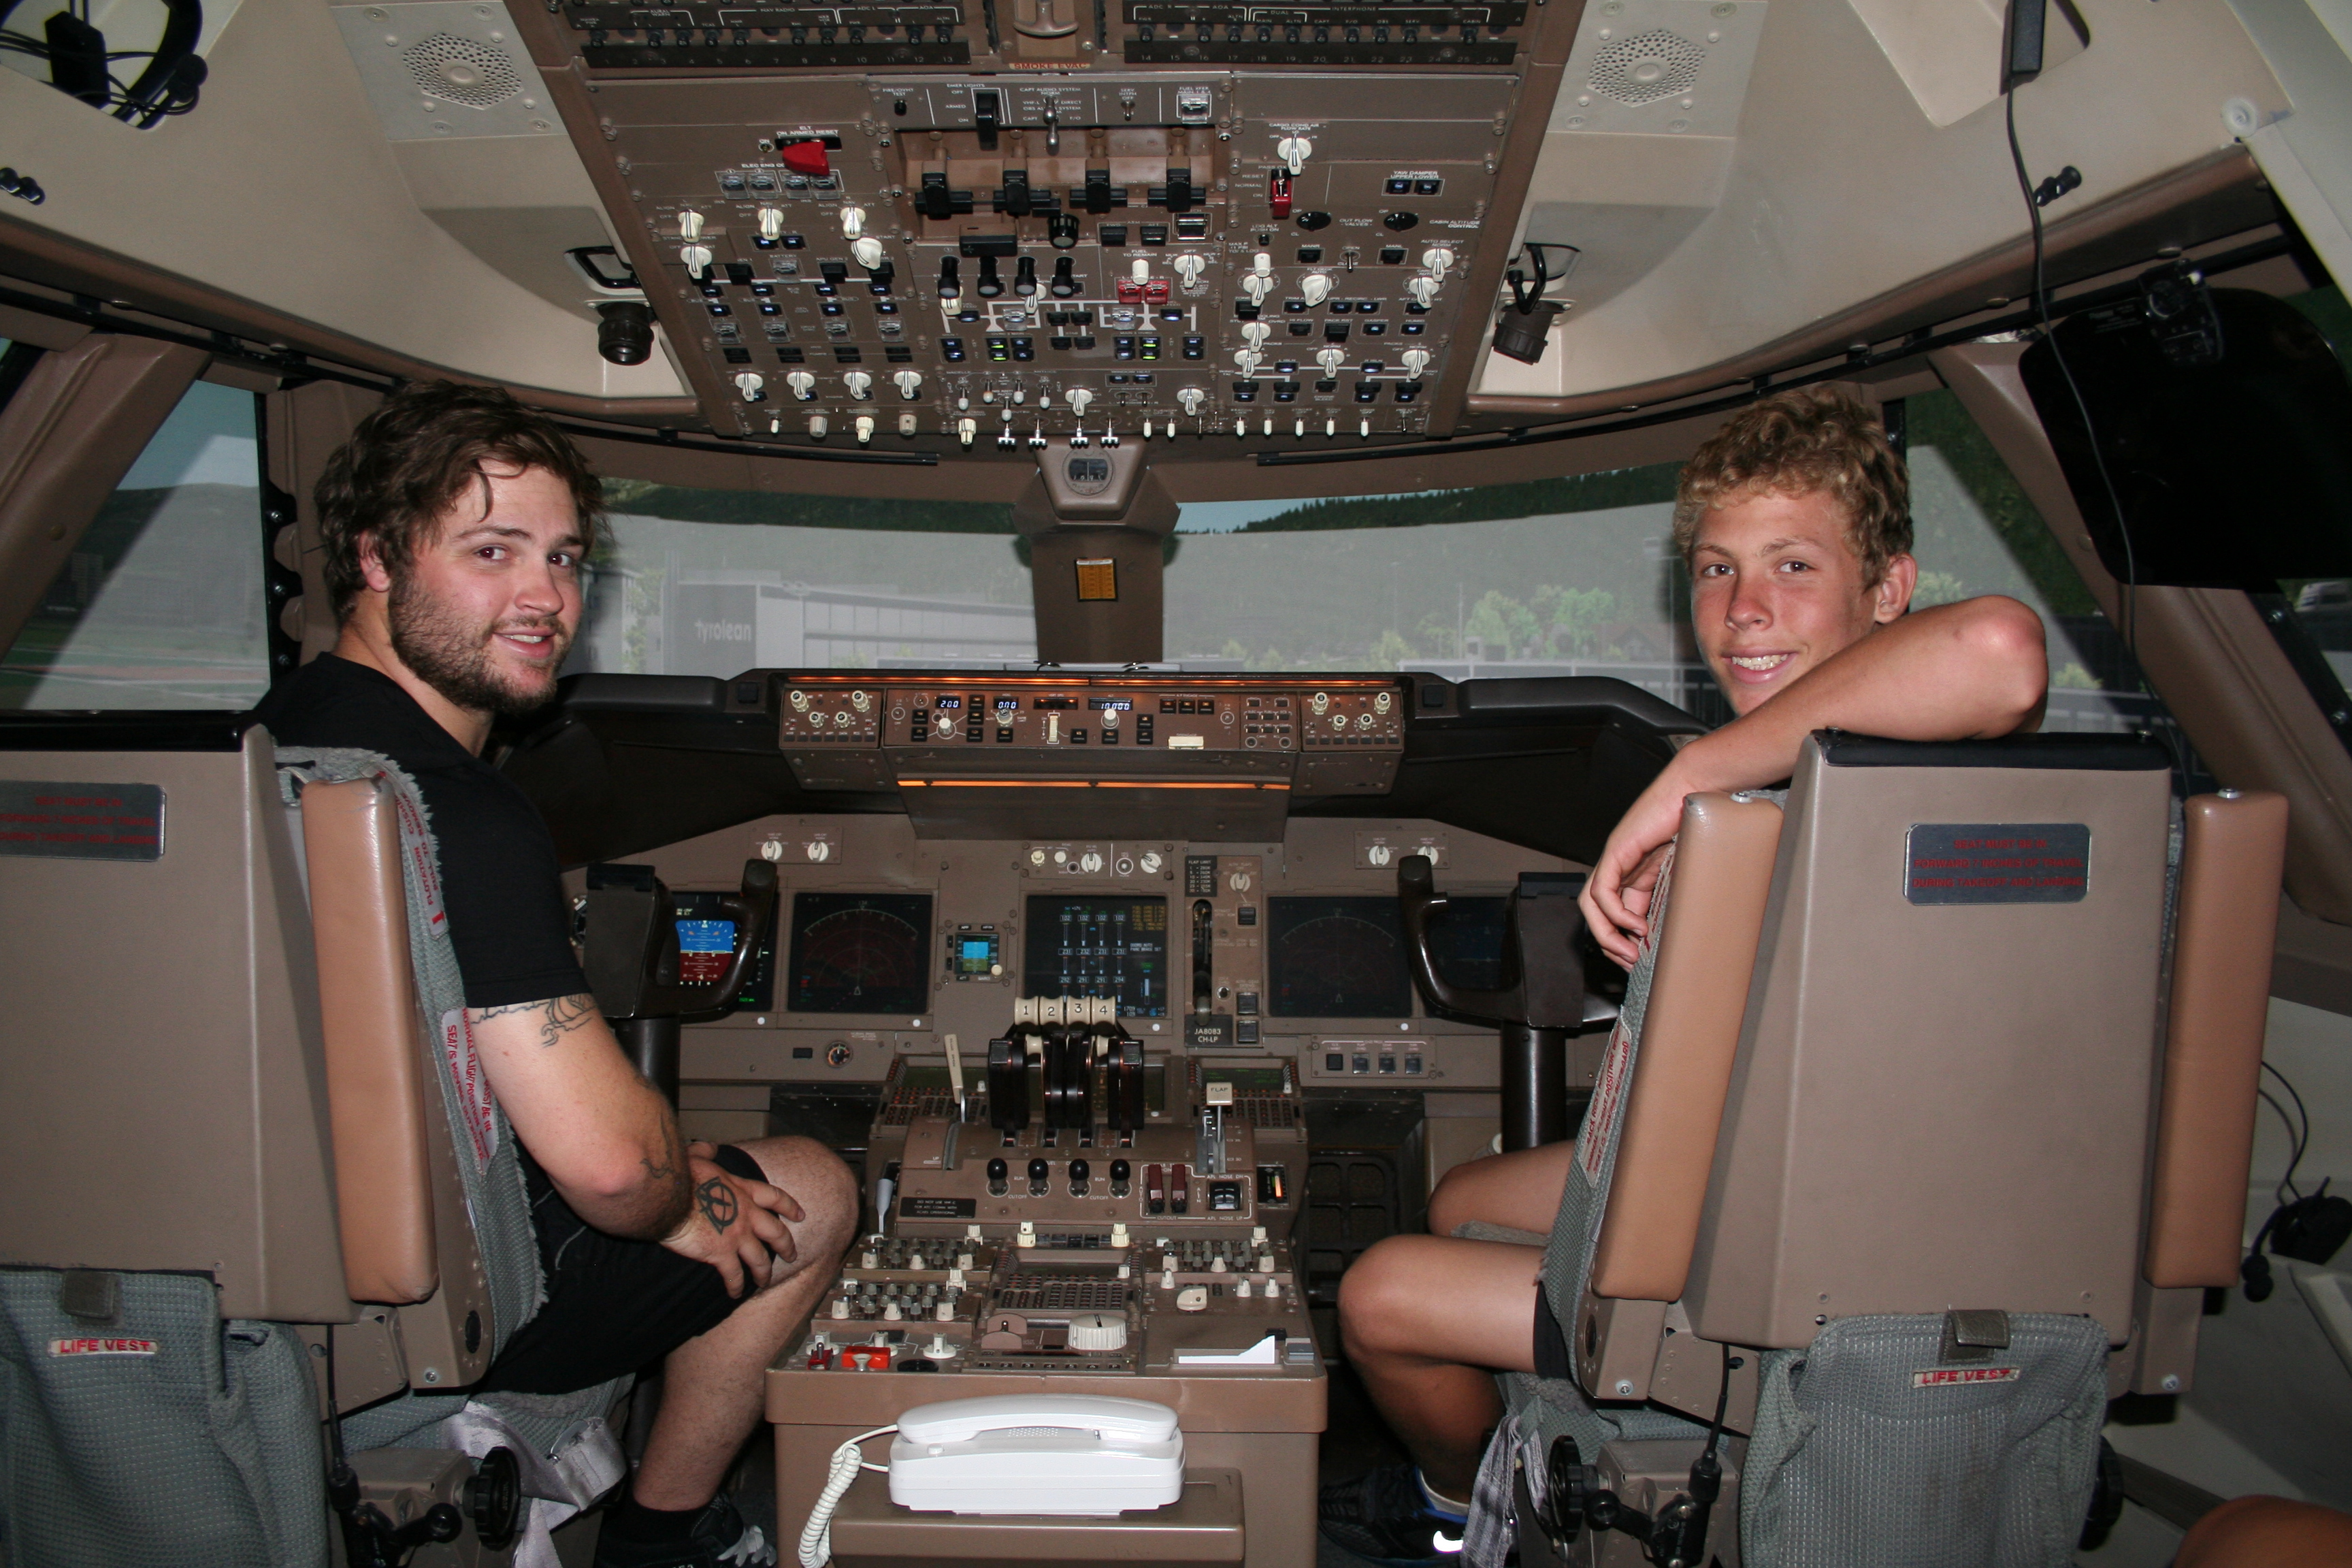 747 JUMBO JET SERIOUS FUN-30 MINUTES